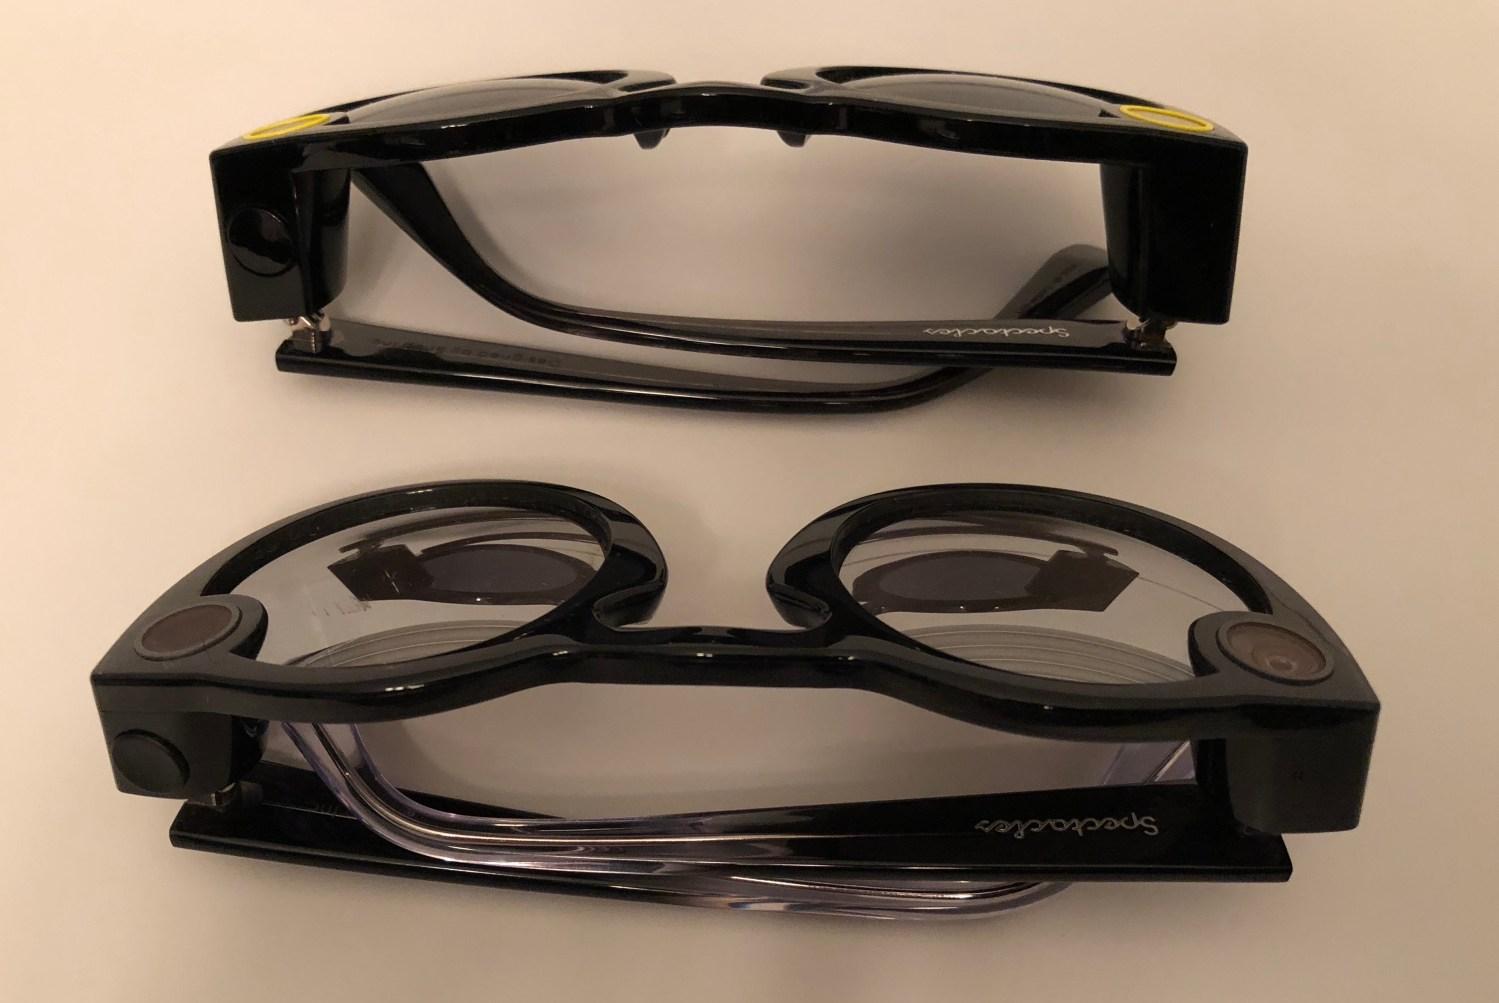 Snapchat Spectacles hardware v1 vs v2